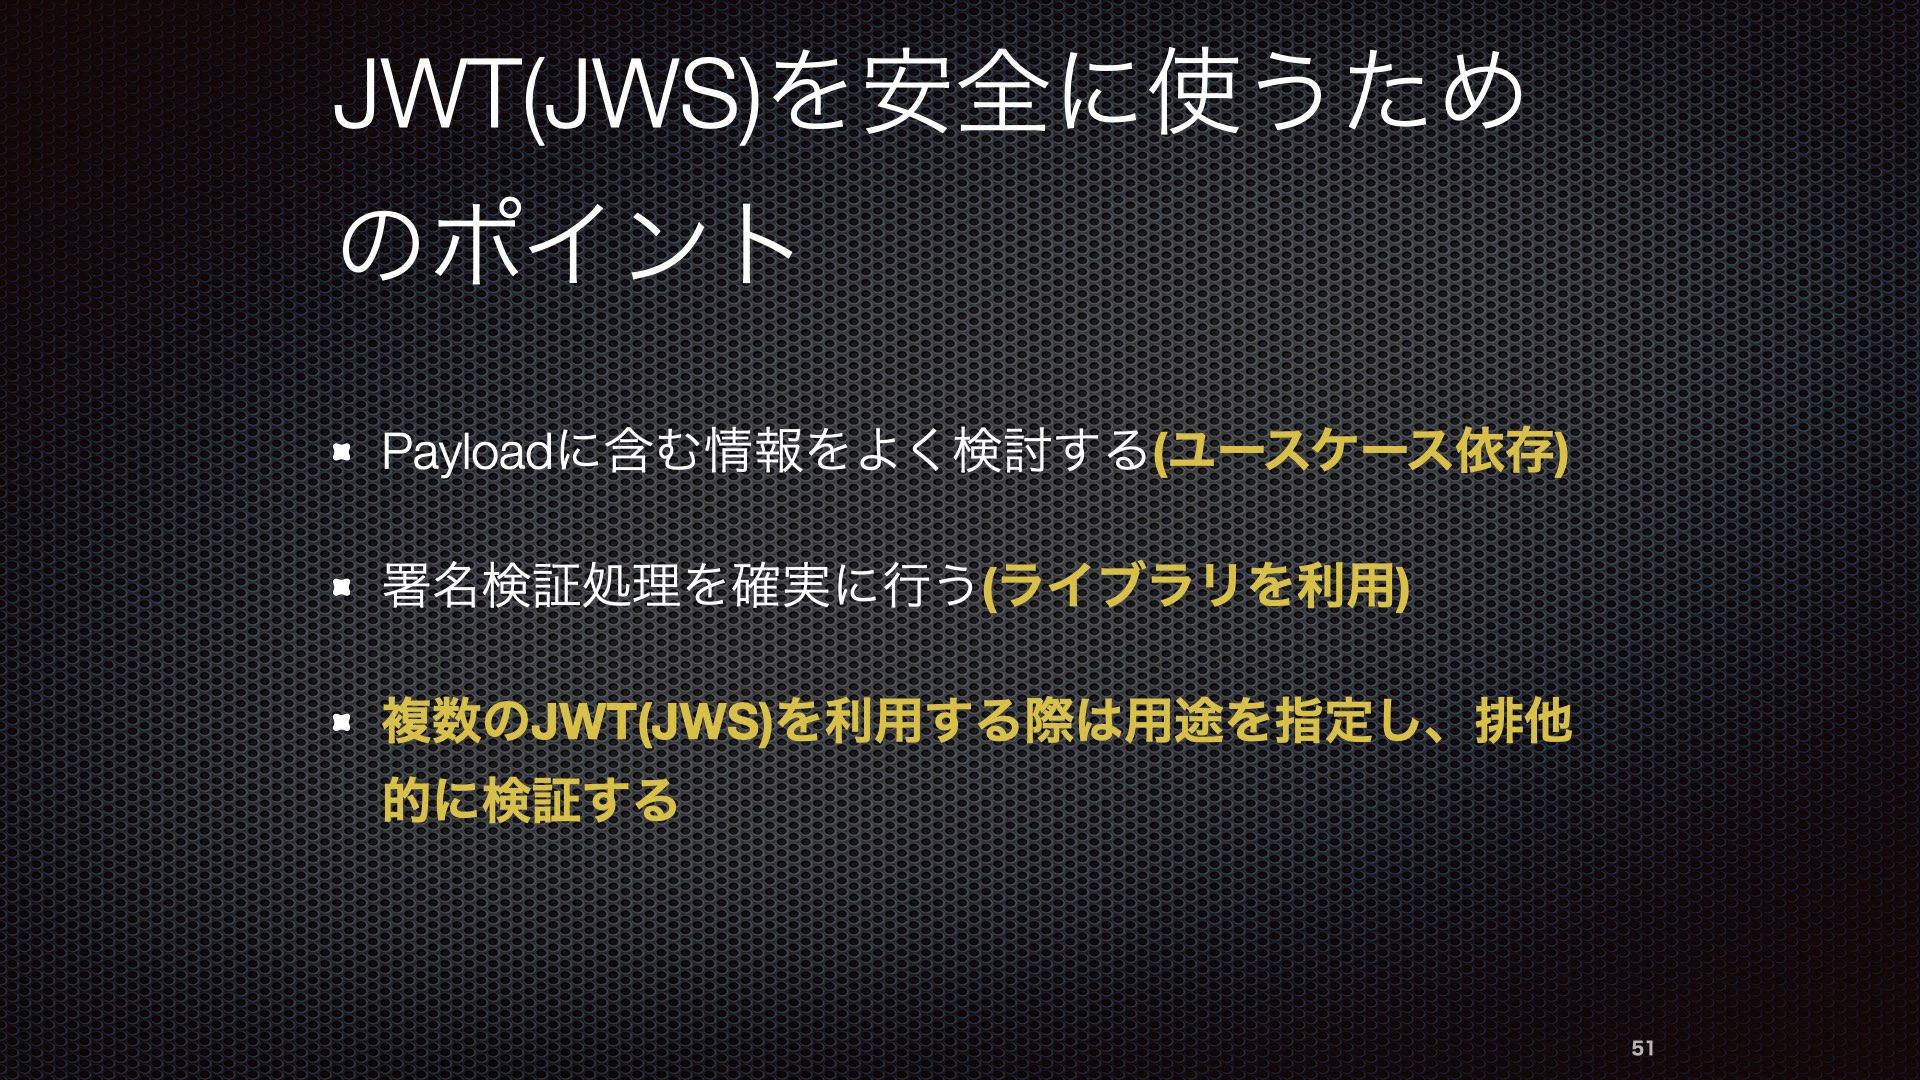 JWTBootCamp2020 051